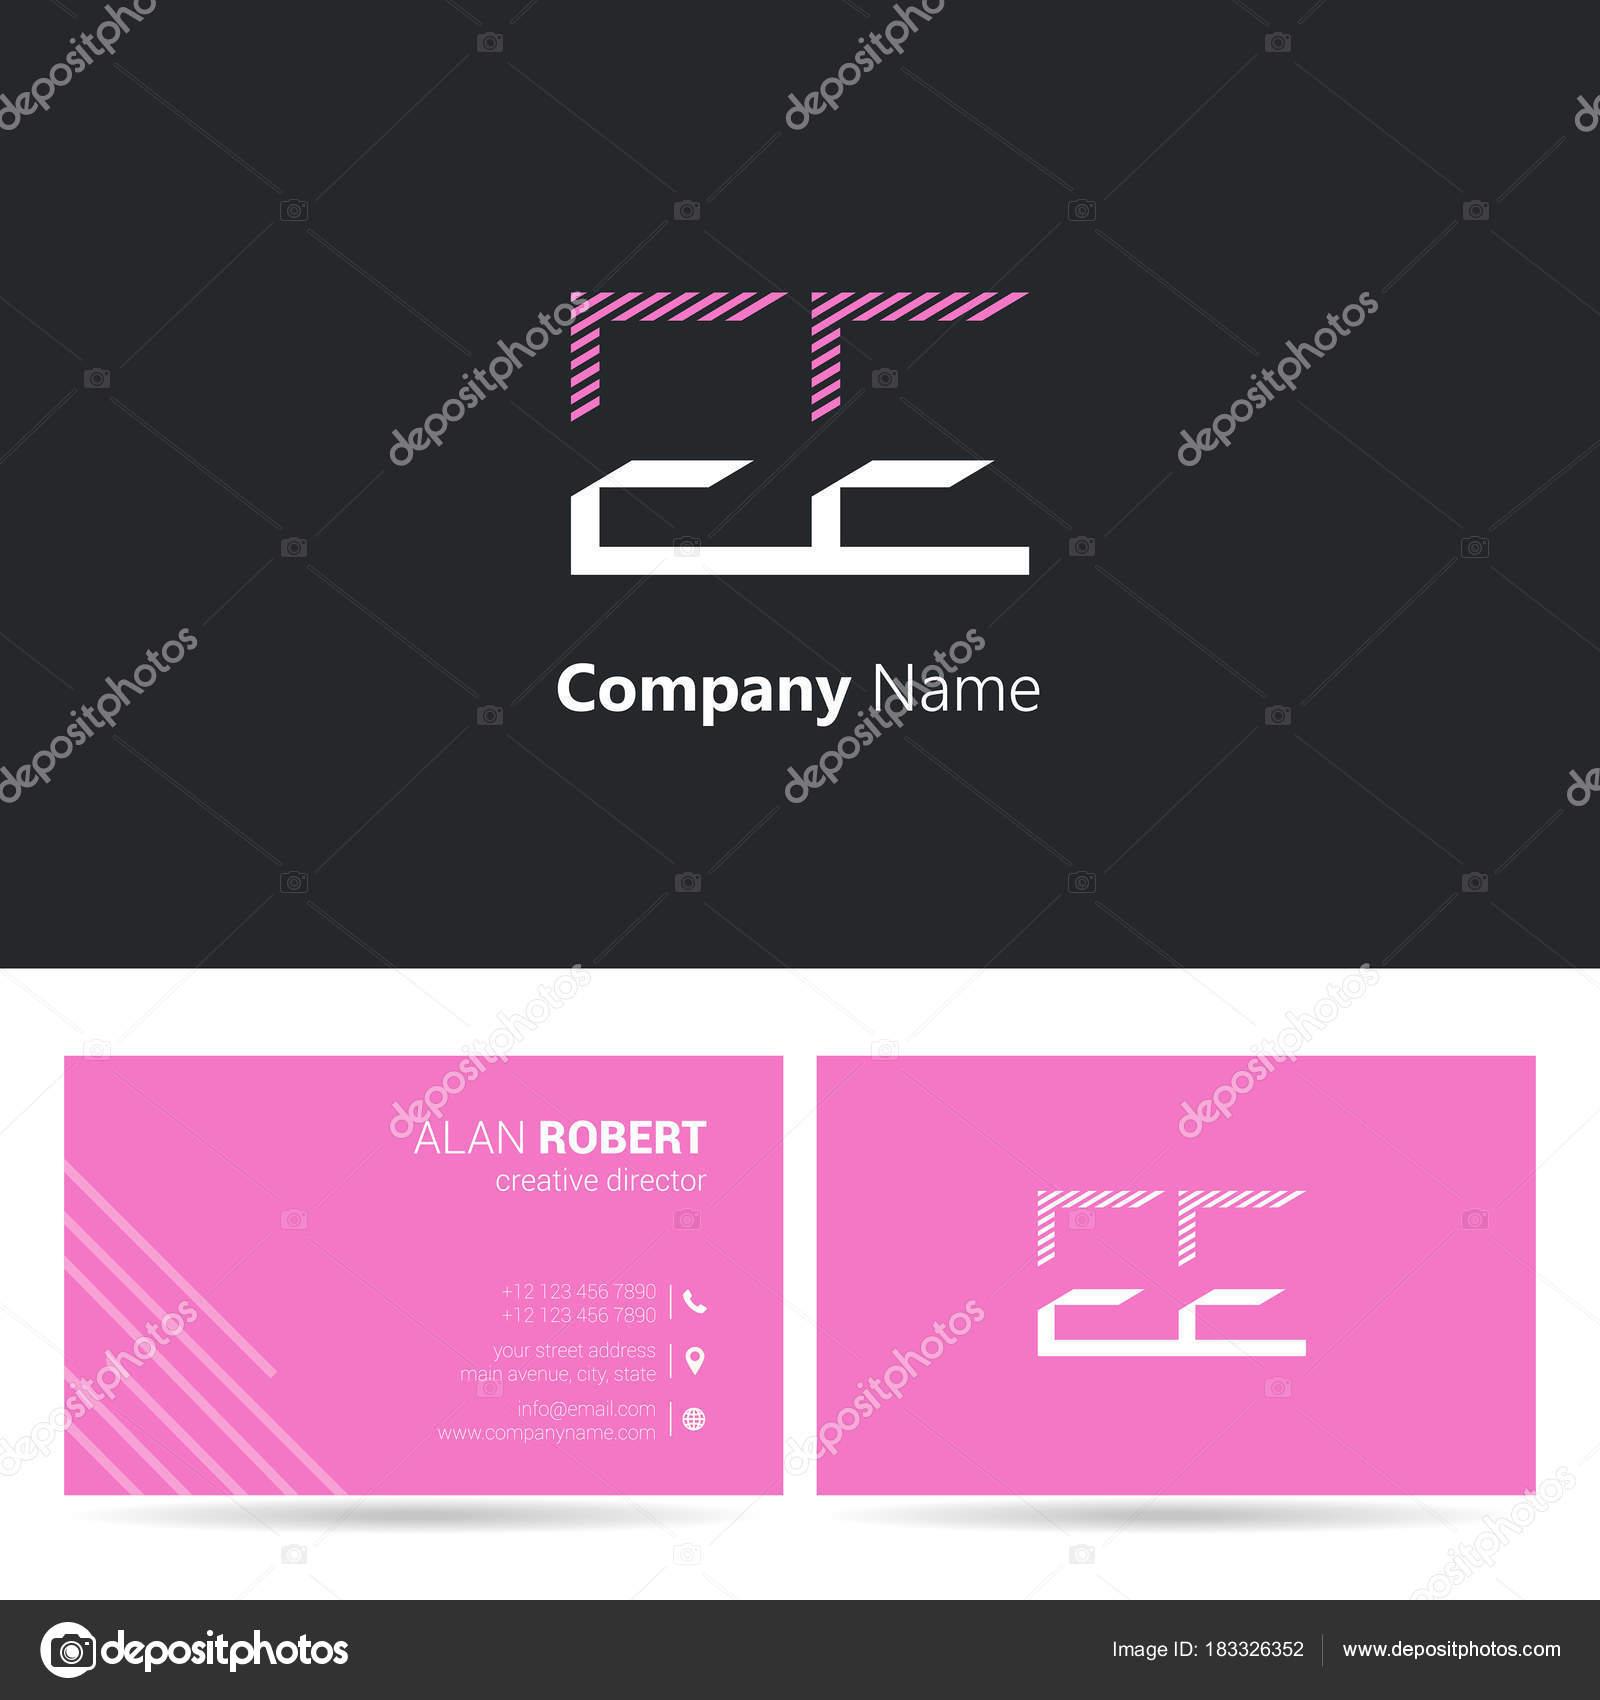 Logo Design Letters Stroke Style Font Business Card Template Black ...